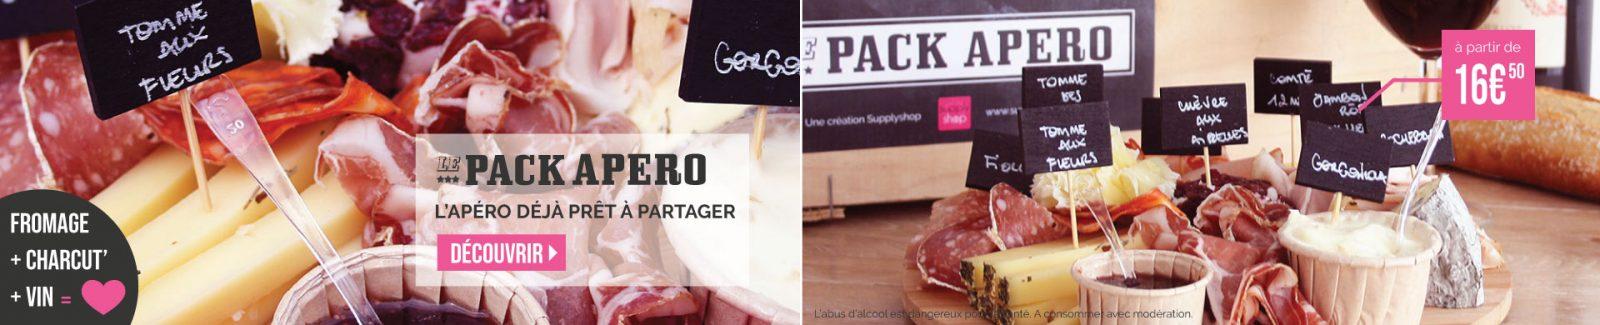 Pack Apéro Caen